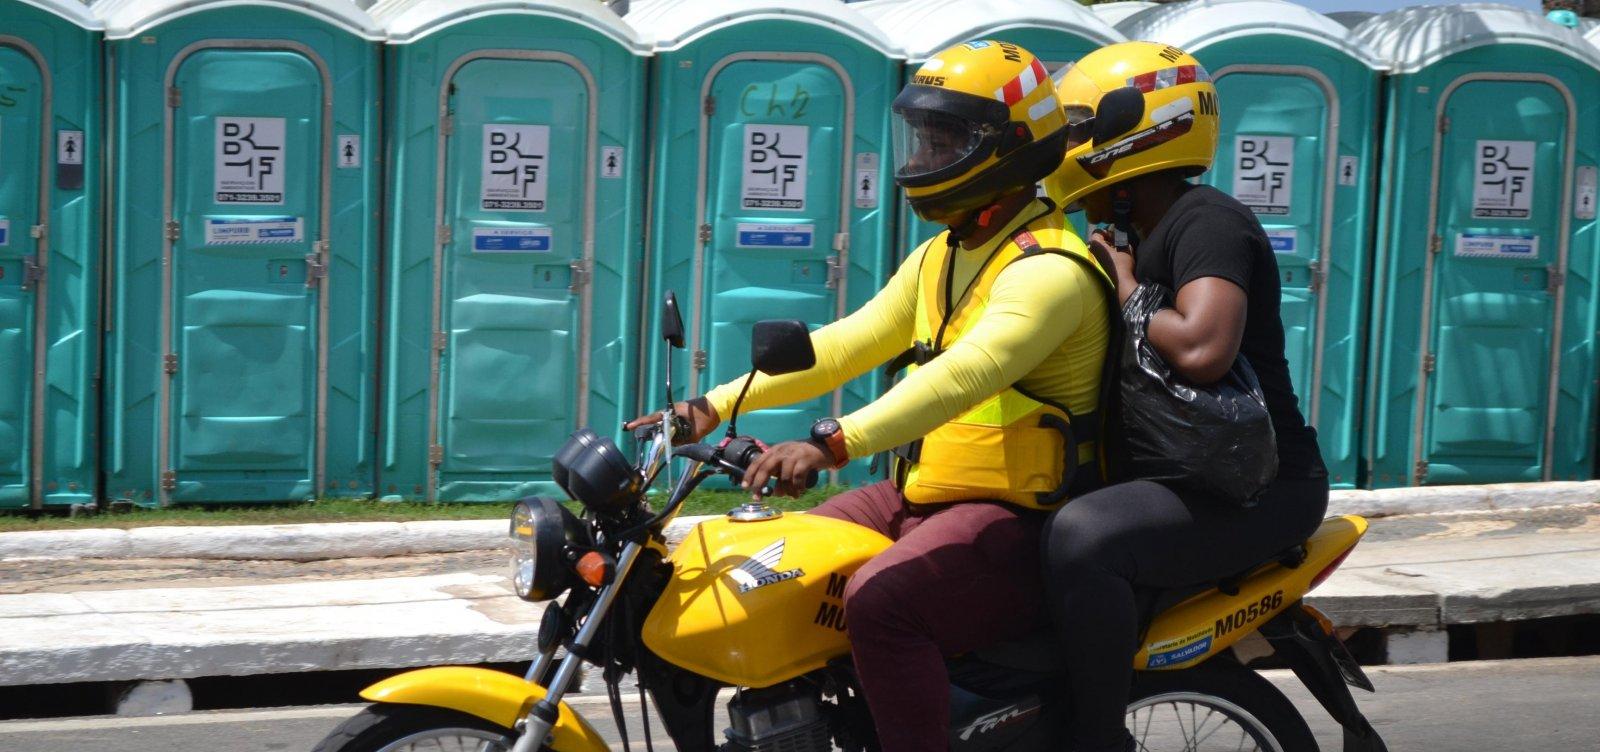 [Prefeitura de Salvador retoma credenciamento para mototaxistas ]